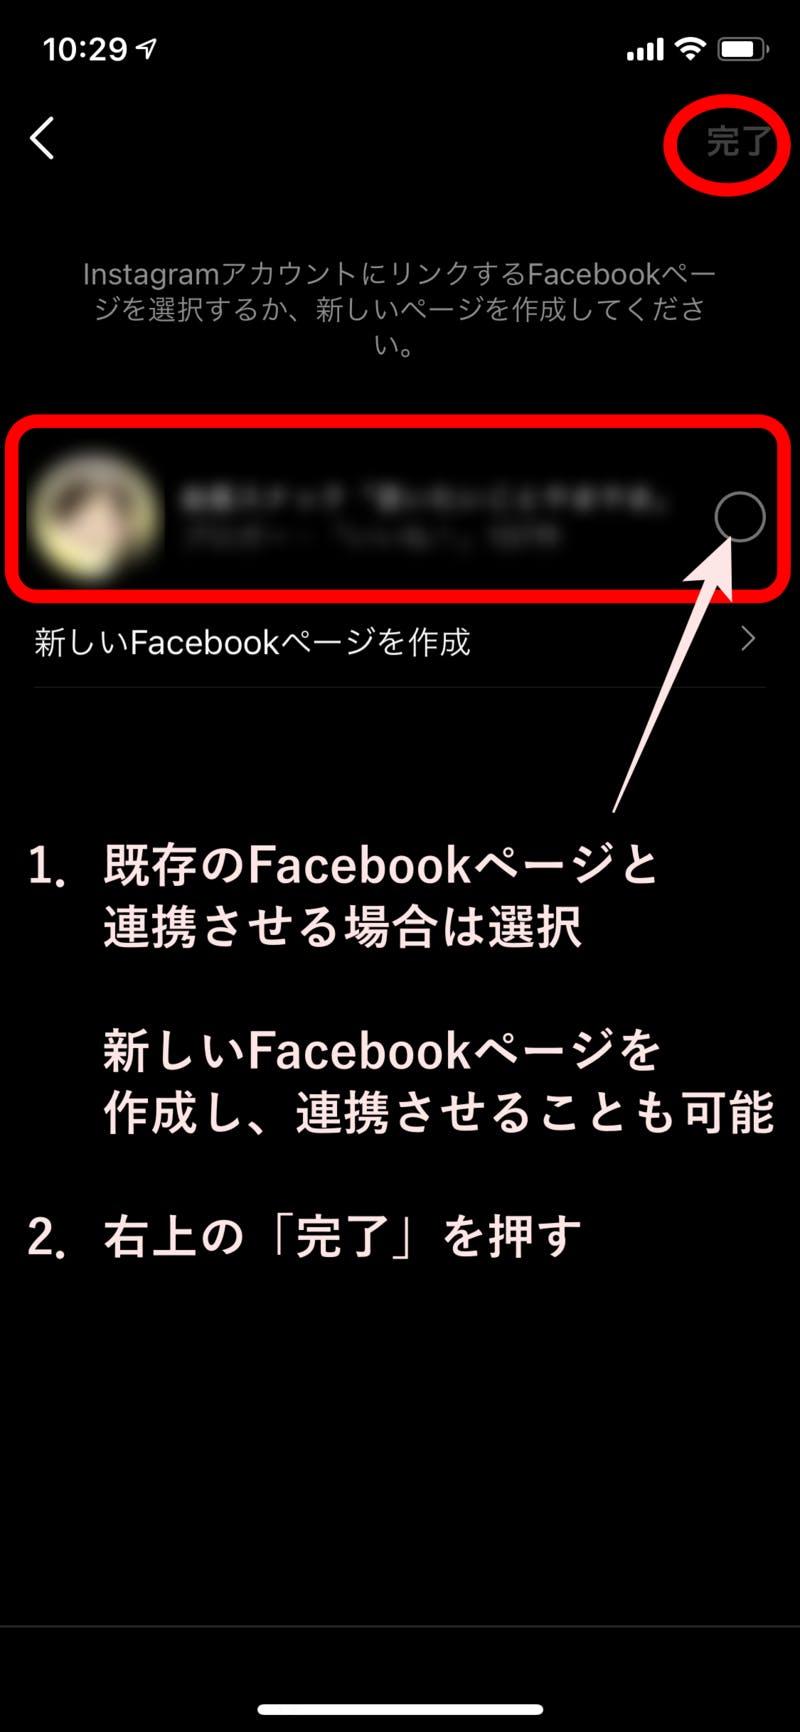 InstagramとFacebookの連携手順画面4(Instagramビジネスアカウントから)